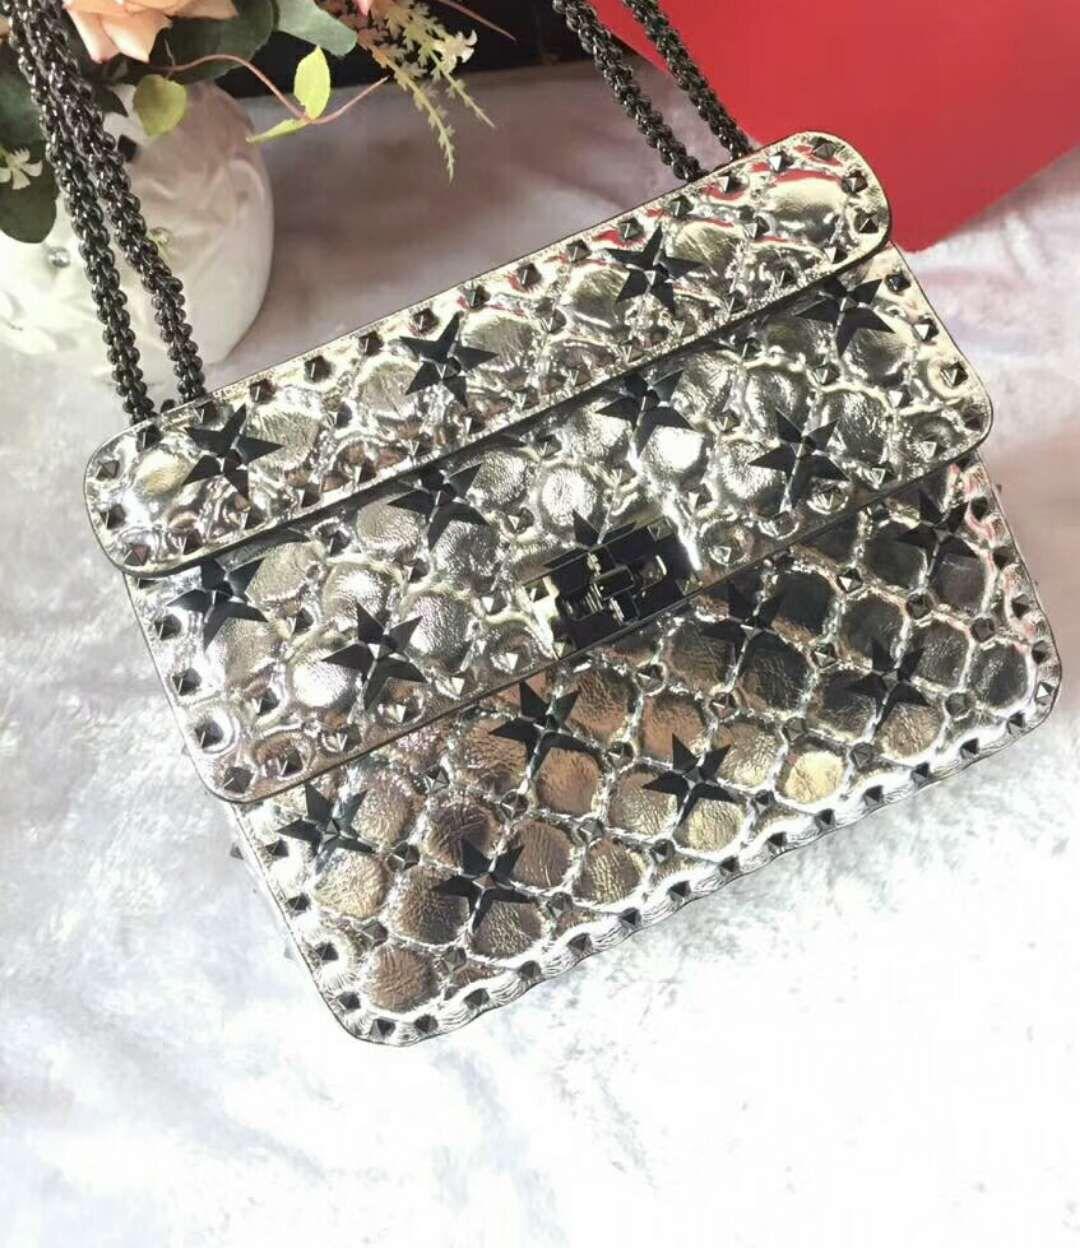 2018 new genuine leather real high fashion handbag diamond lattice metallic silver color stars cross body pack sheep leathe full stars 24cm